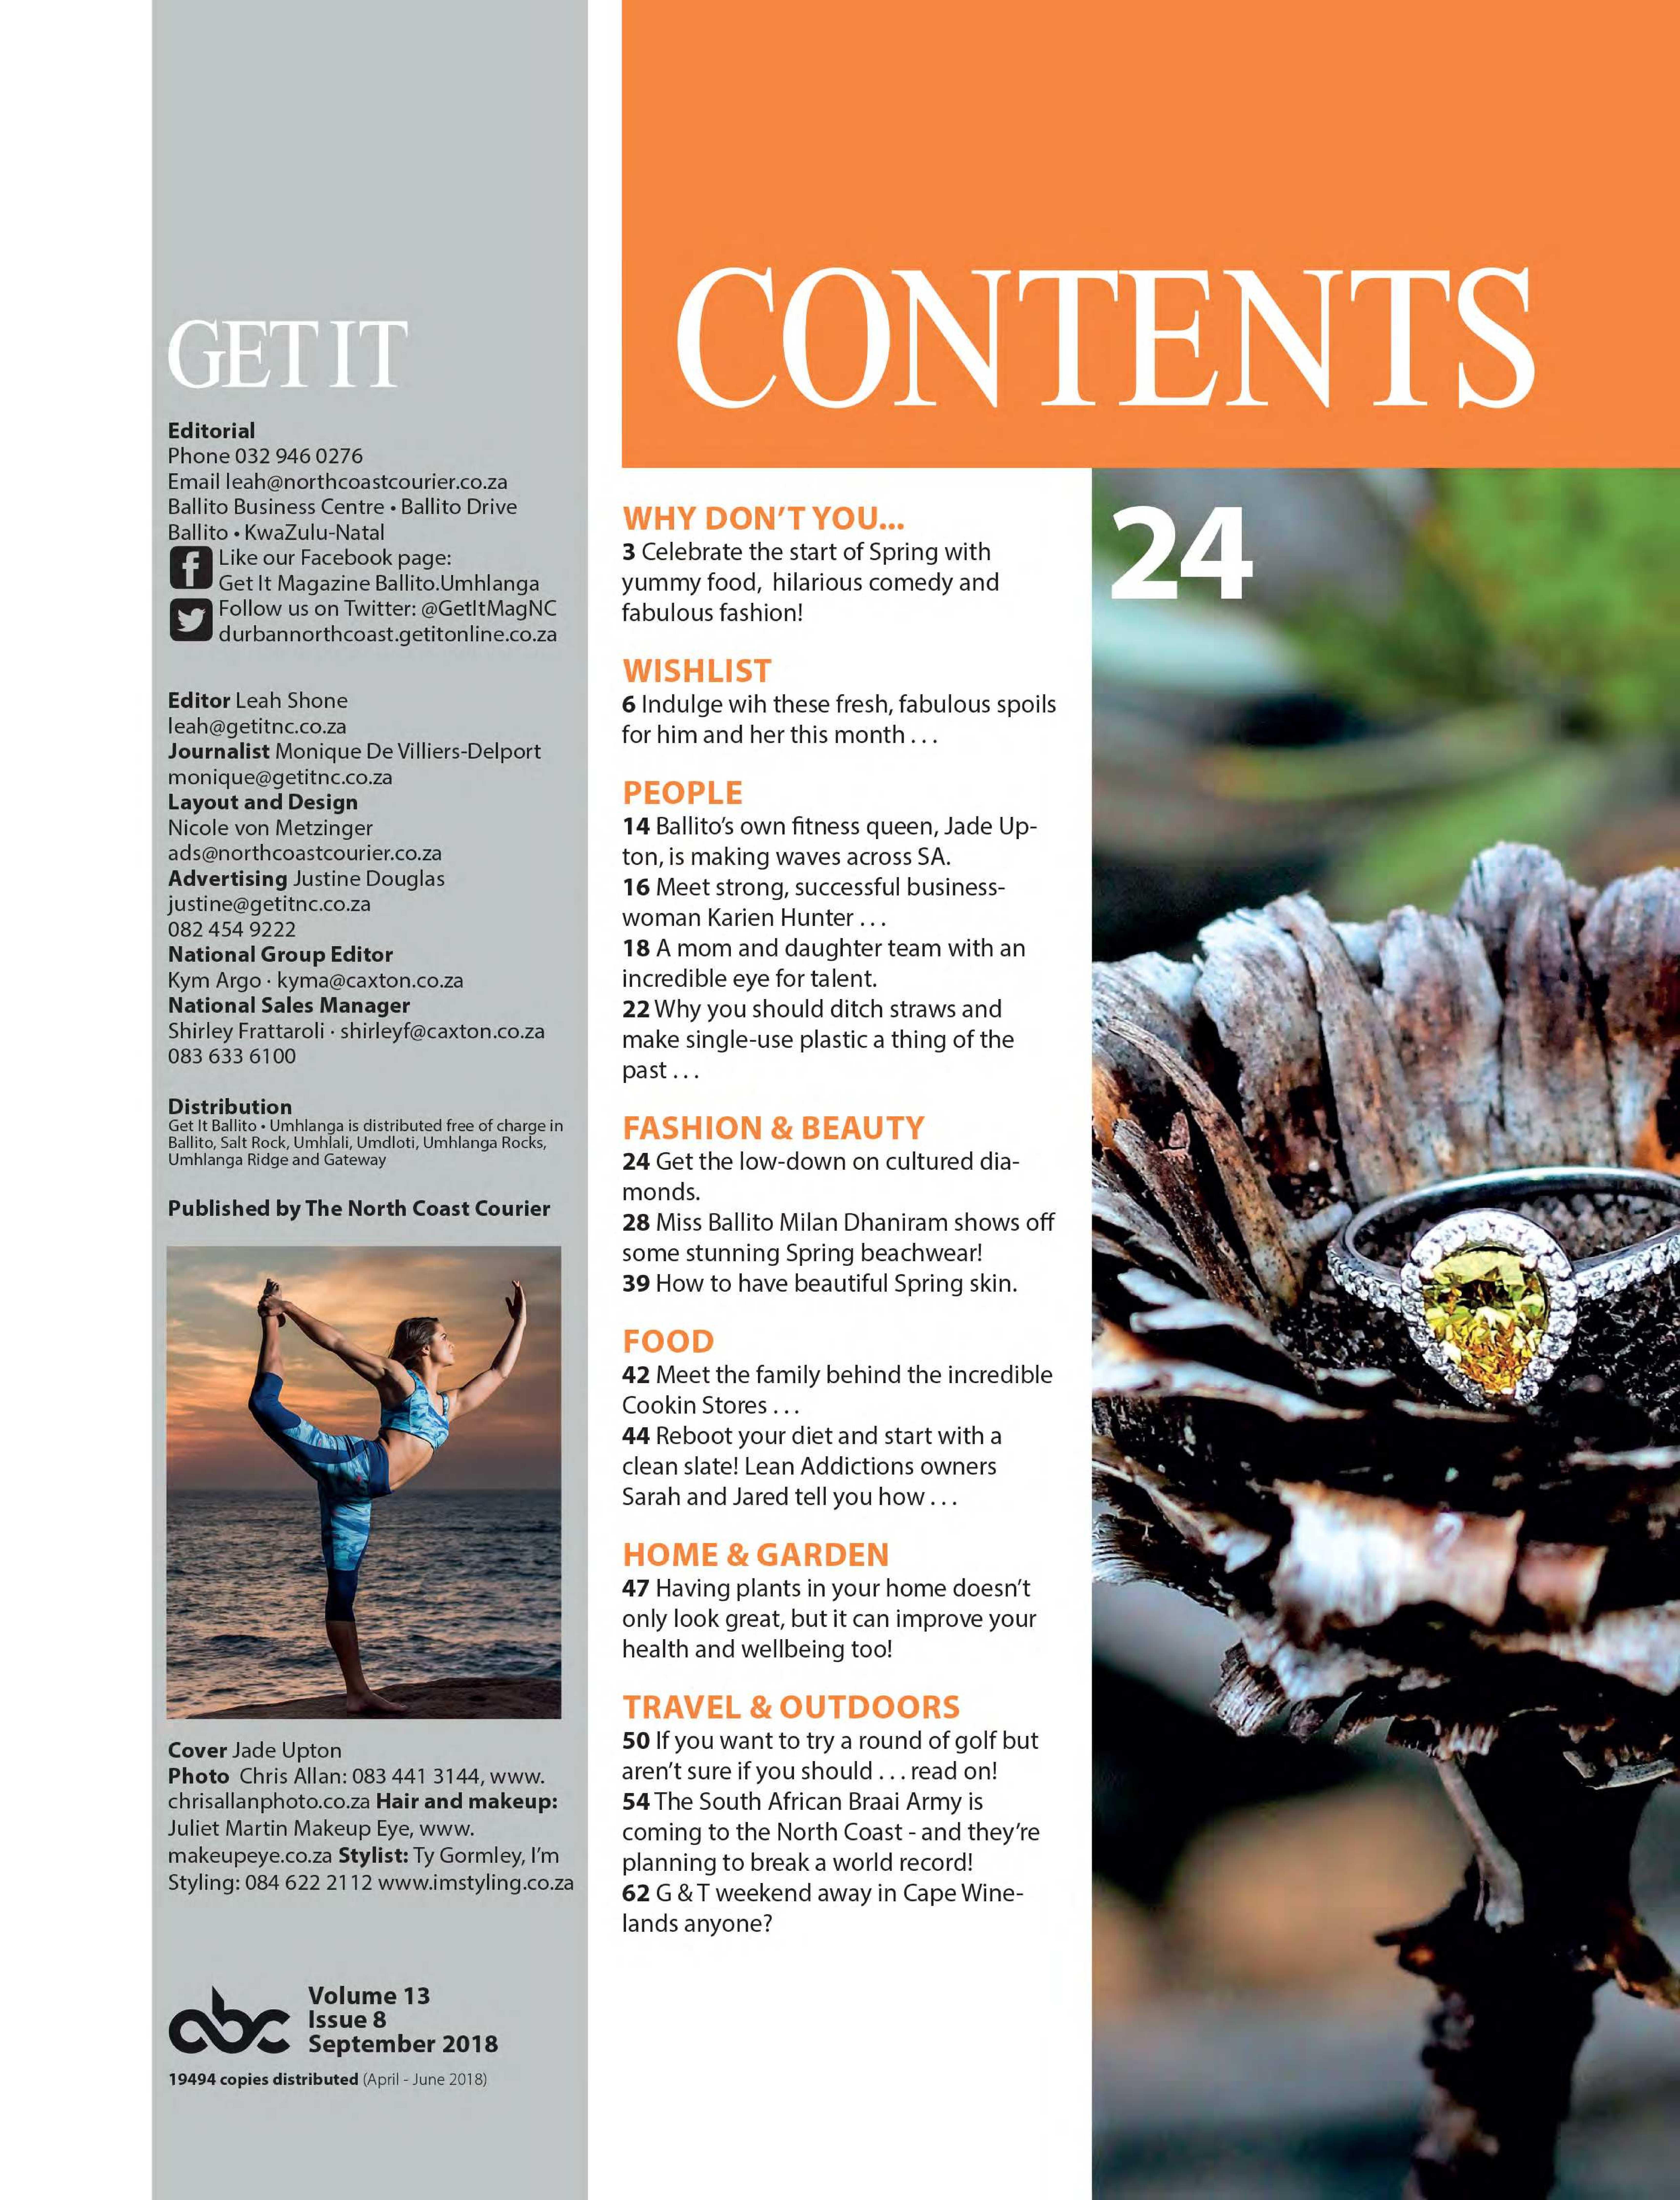 get-magazine-ballitoumhlanga-september-2018-epapers-page-3